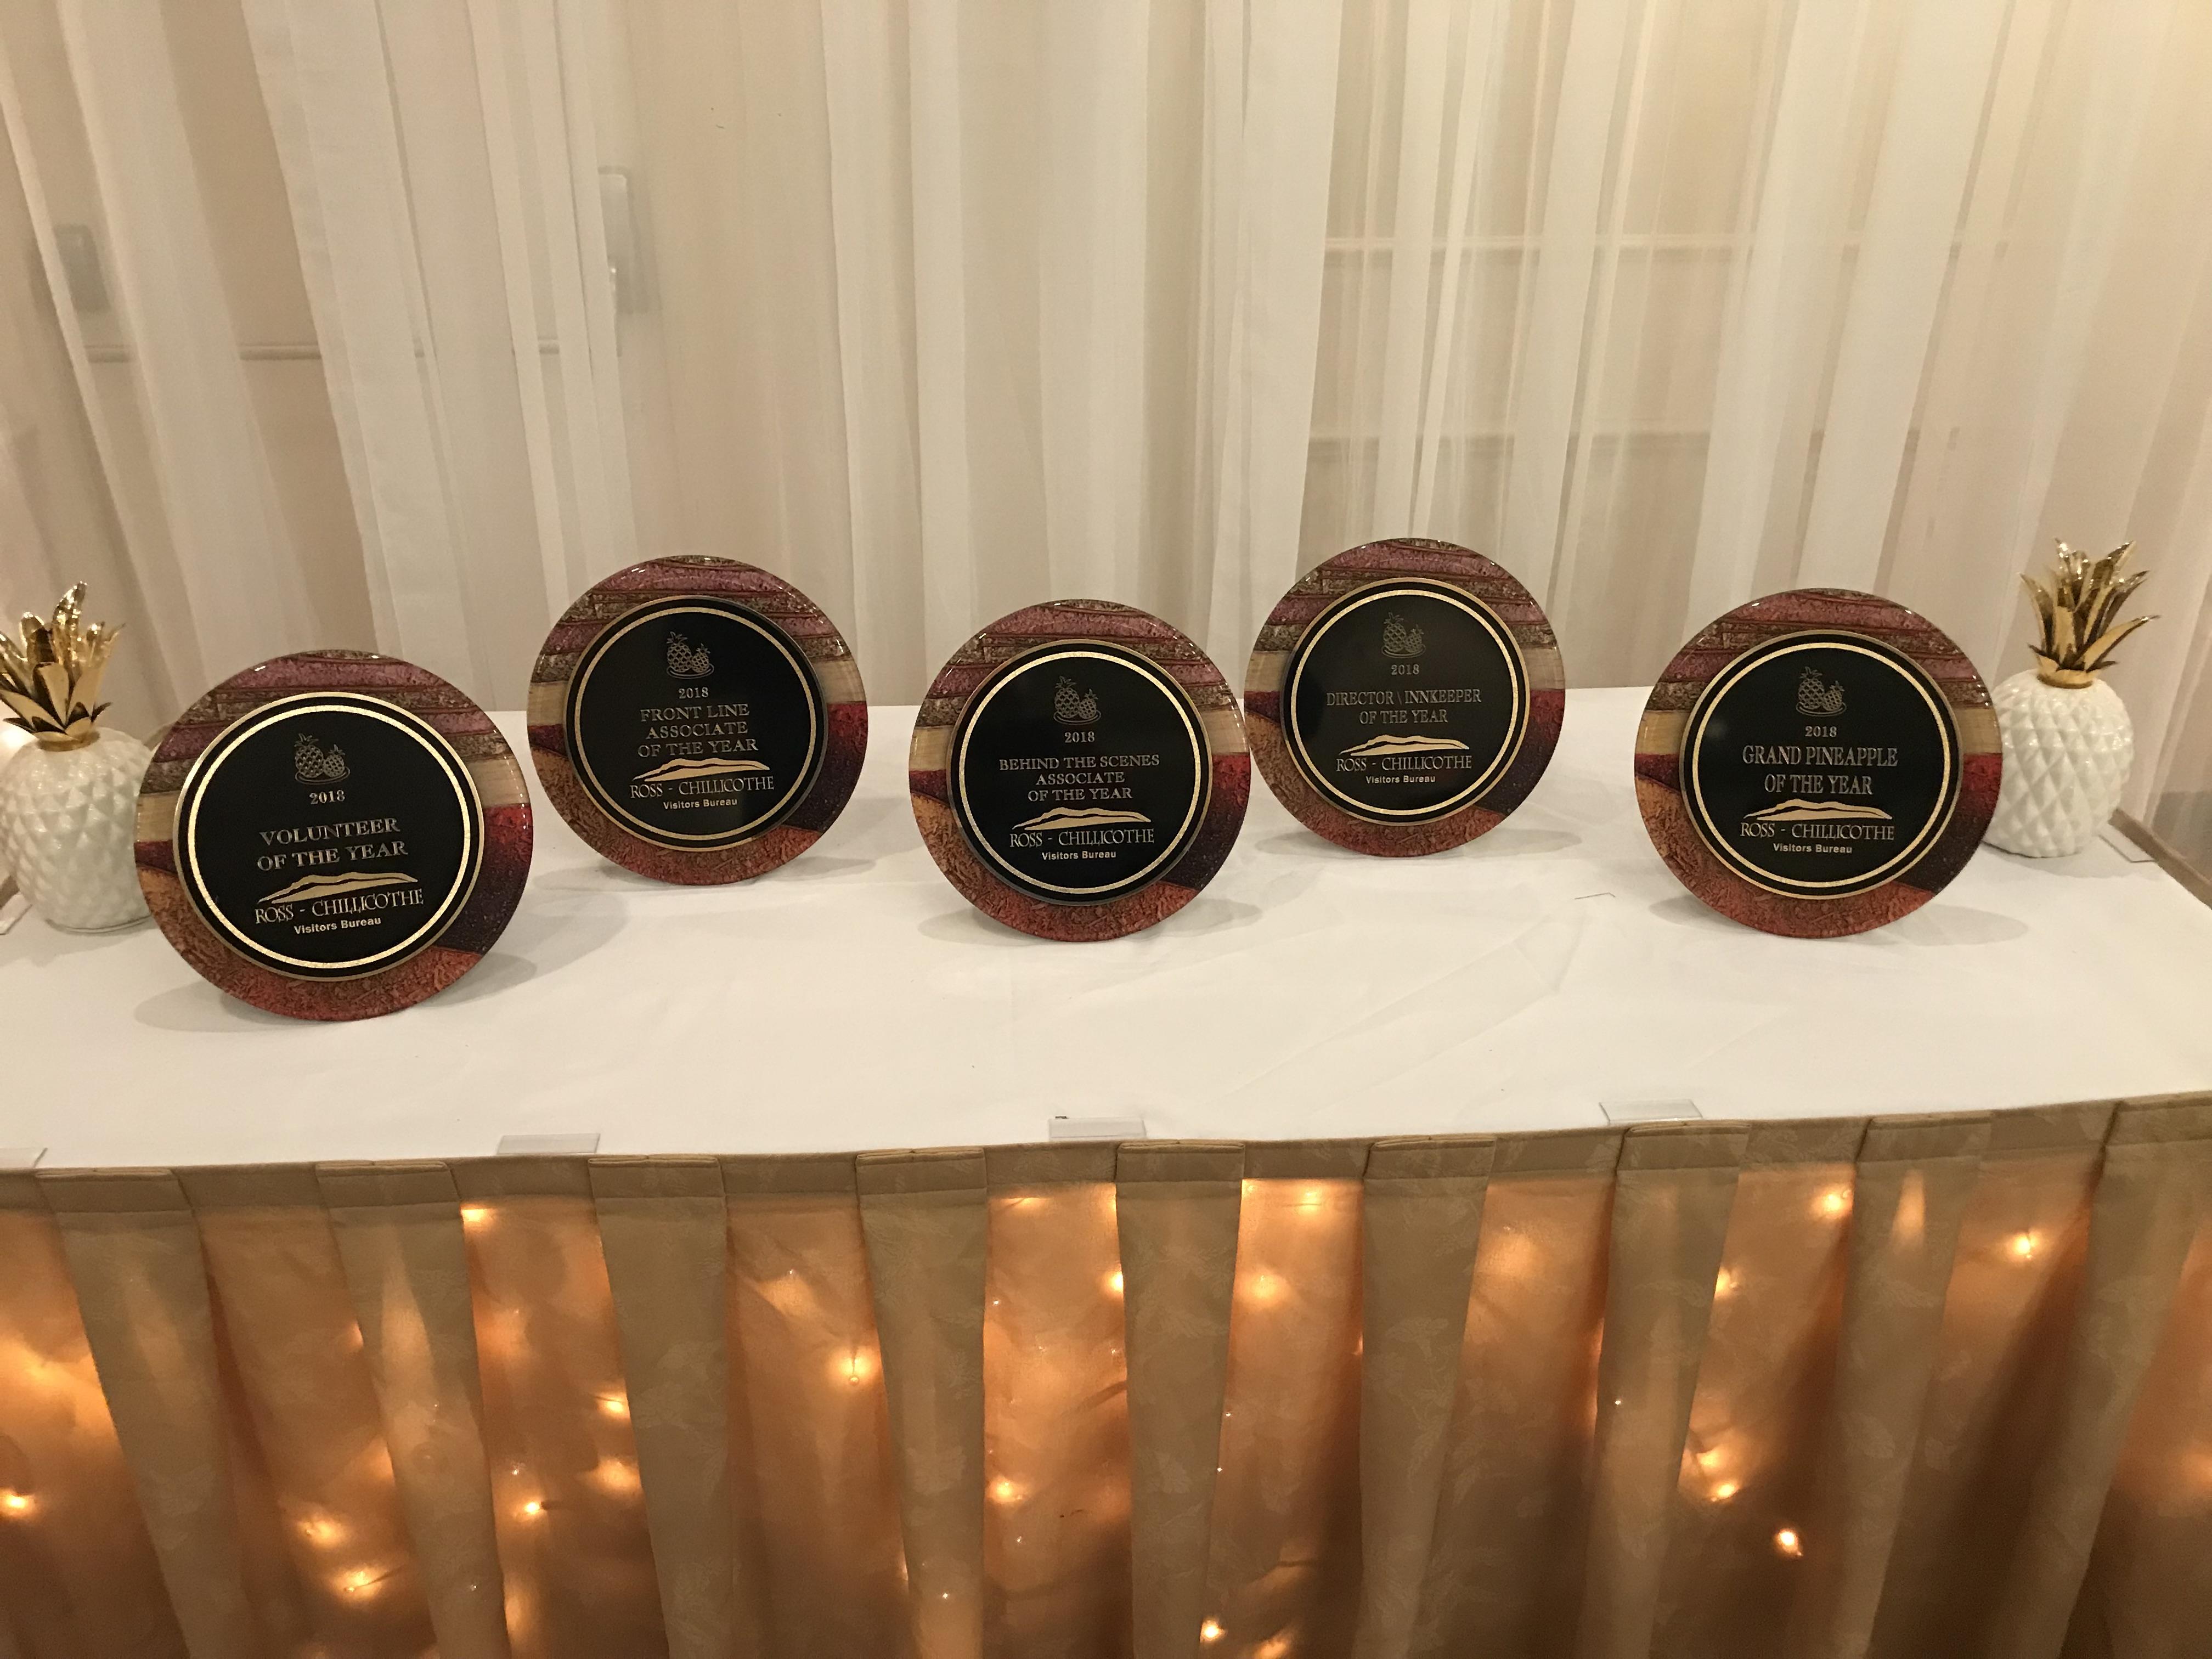 Ross County Tourism Banquet 2018